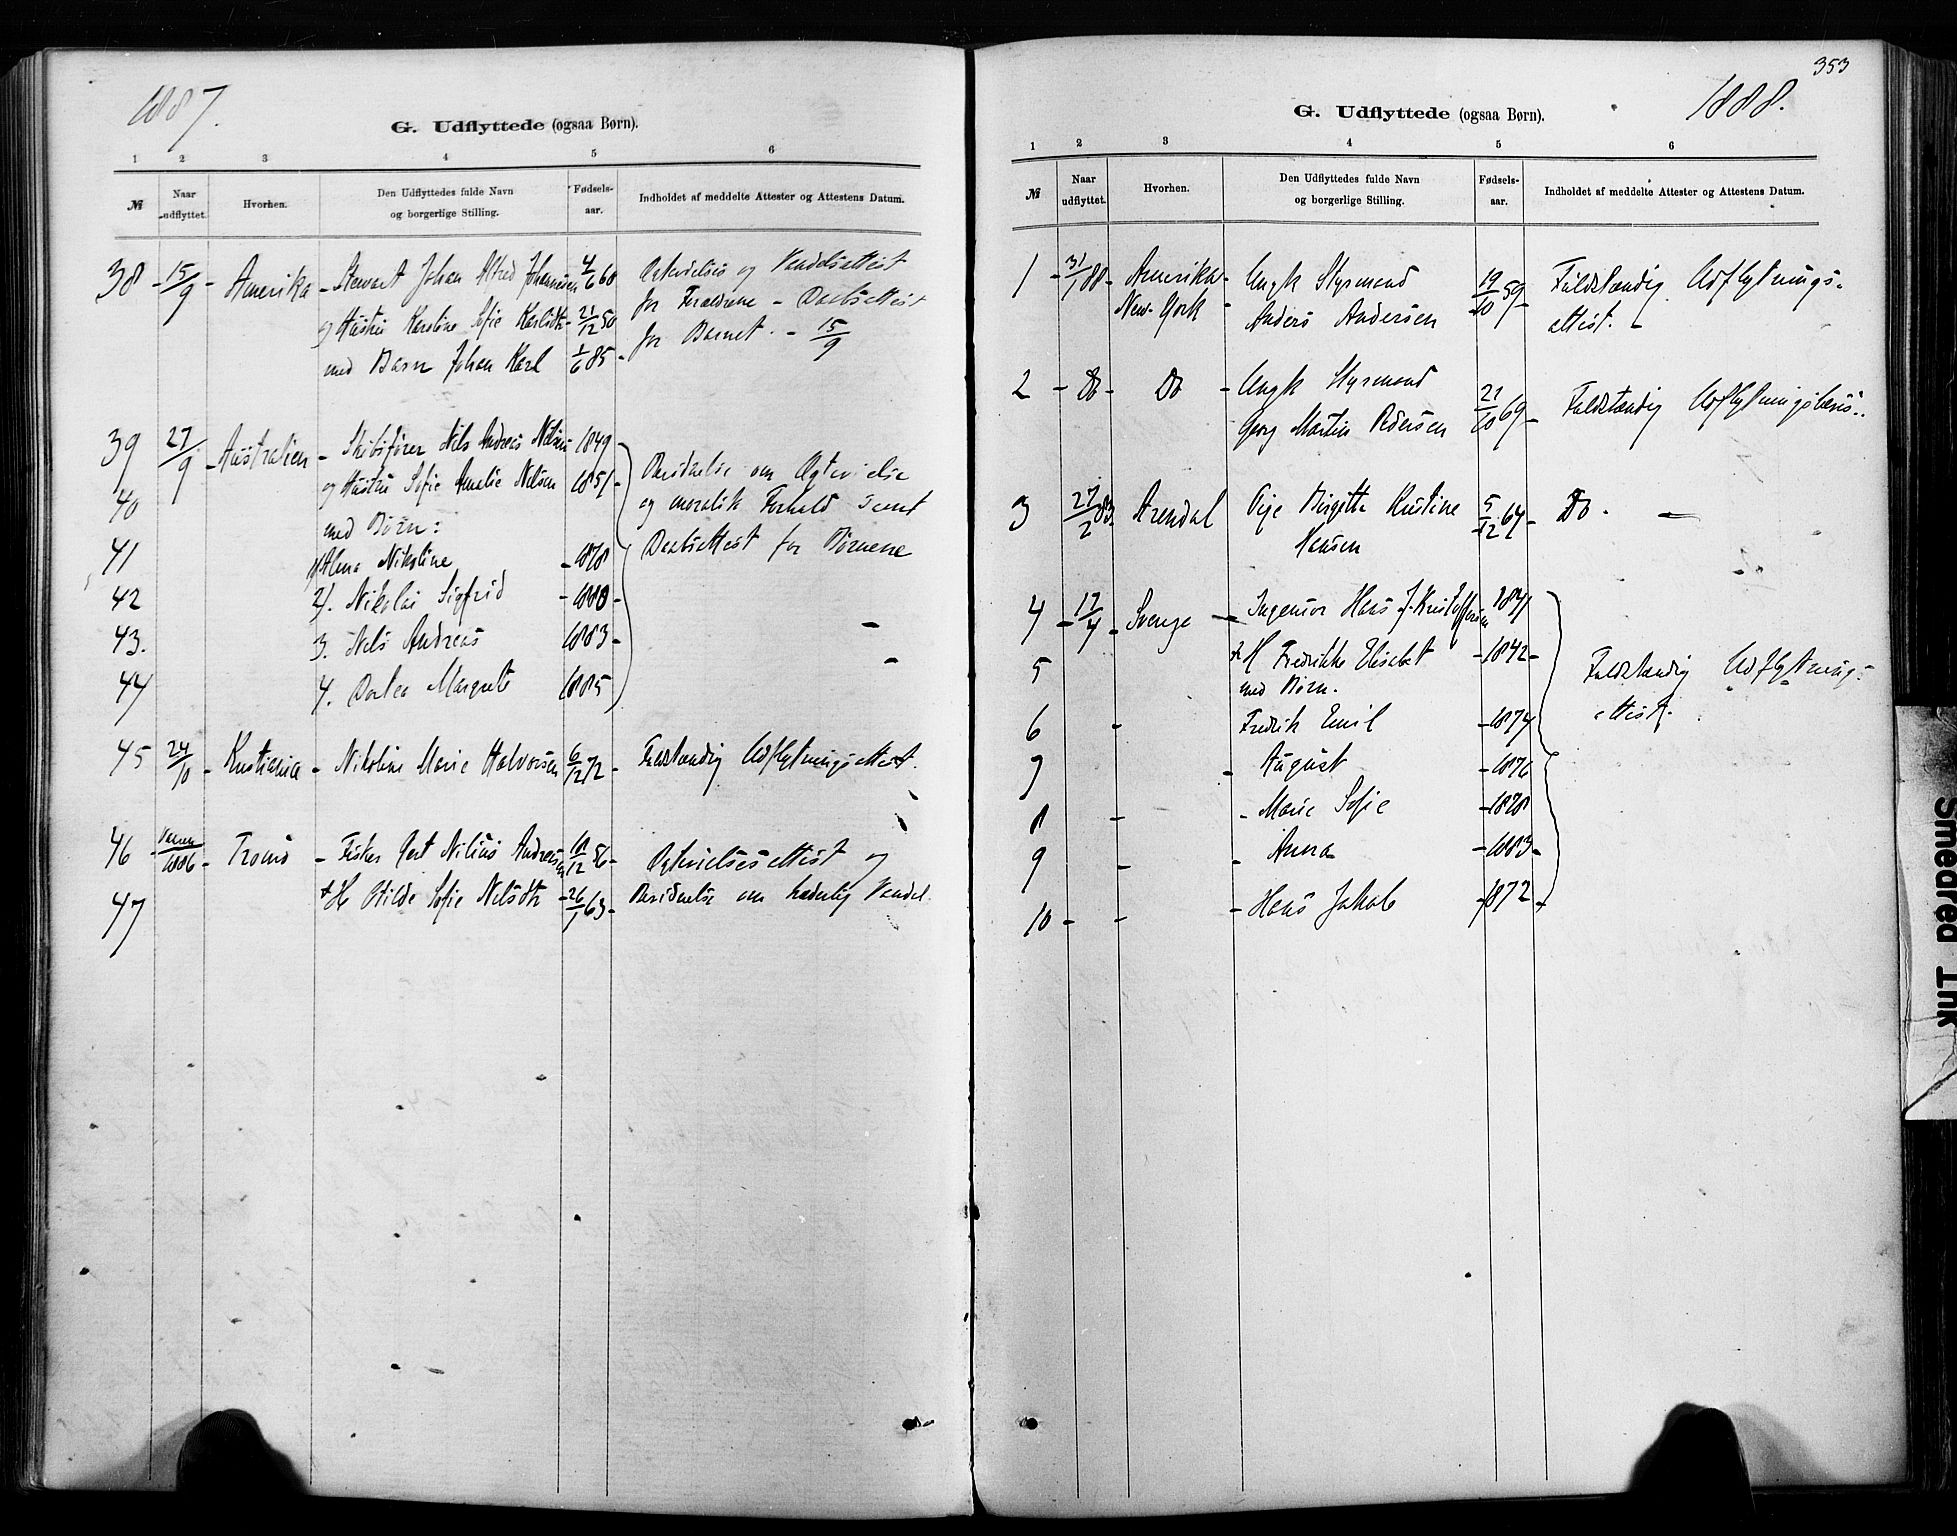 SAK, Hisøy sokneprestkontor, F/Fa/L0003: Ministerialbok nr. A 3, 1881-1894, s. 353